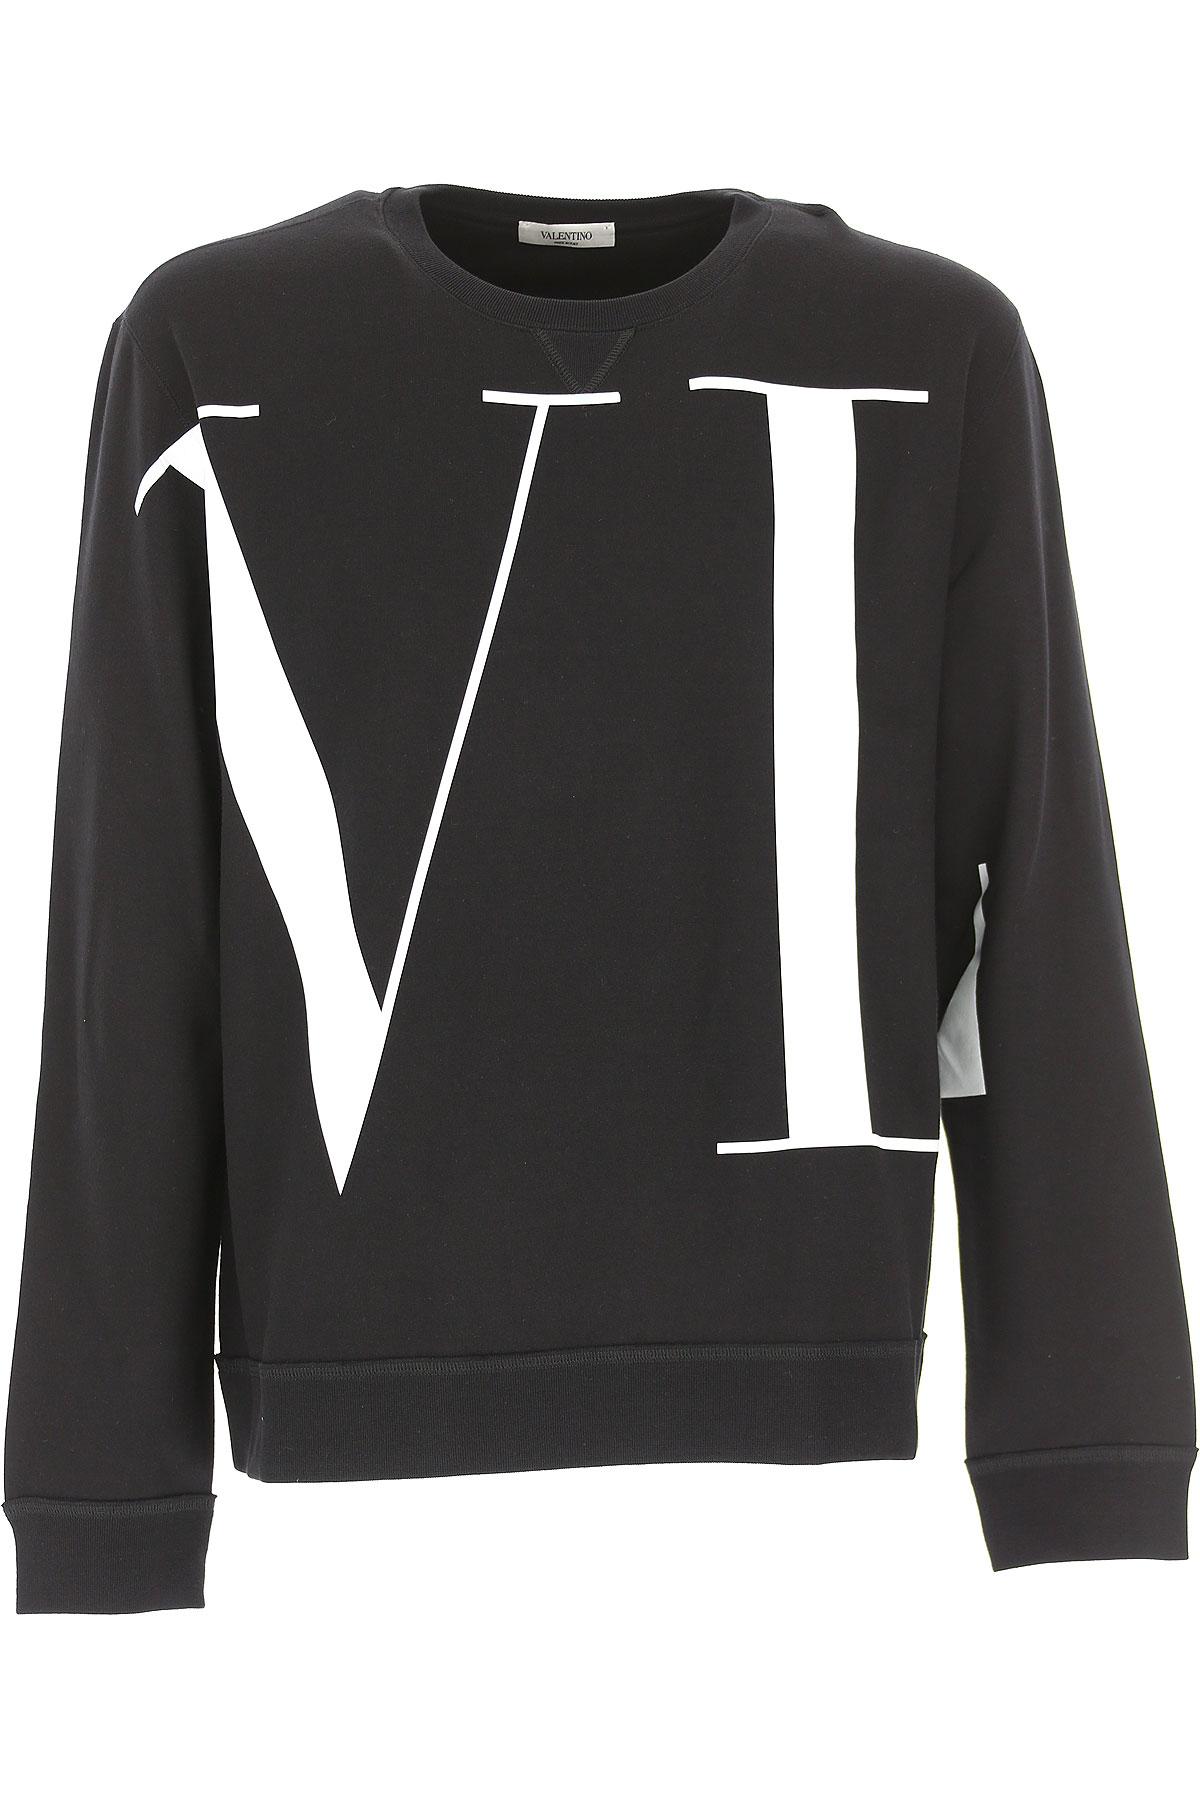 Valentino Sweatshirt for Men, Black, Cotton, 2017, L M S XL USA-473029